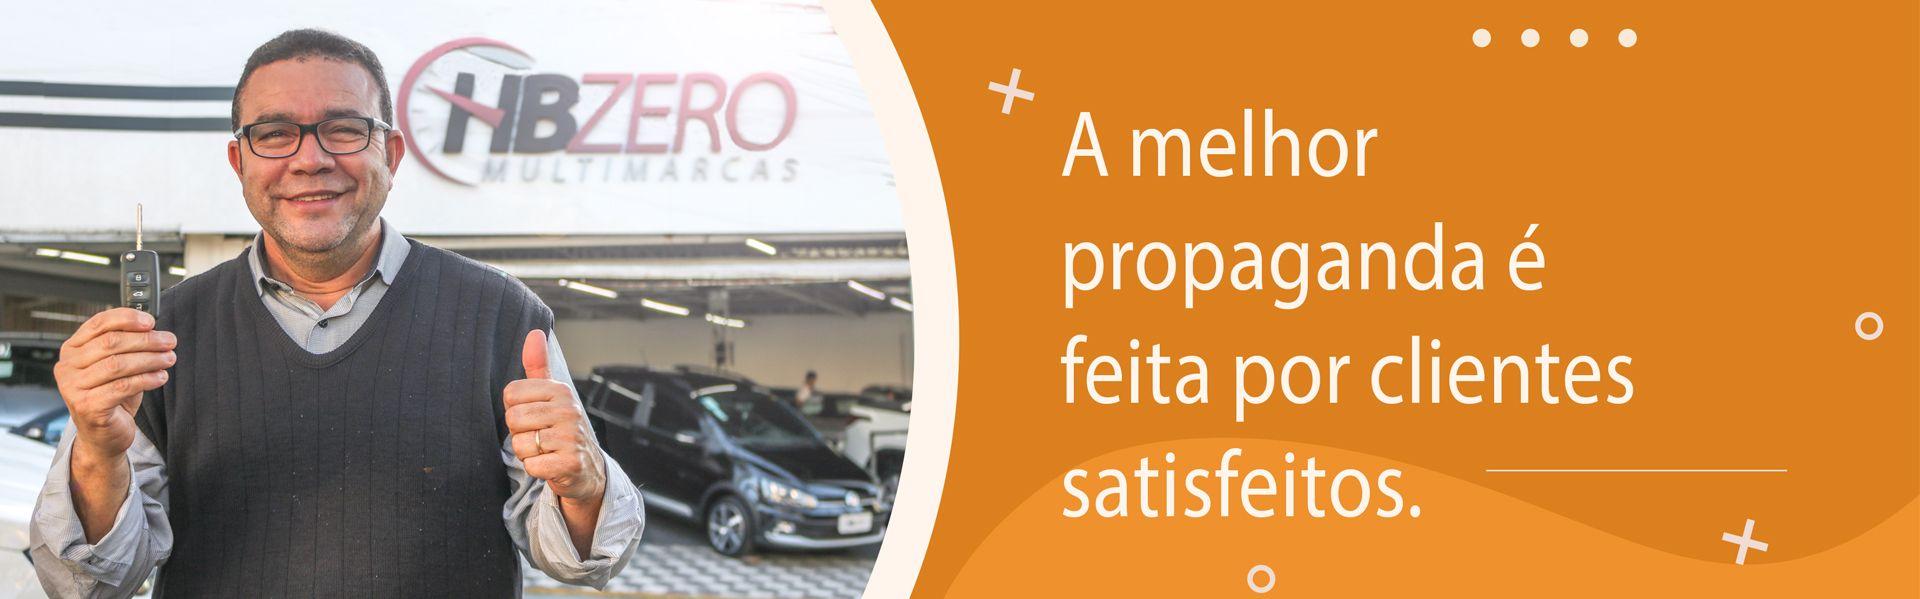 banner do site